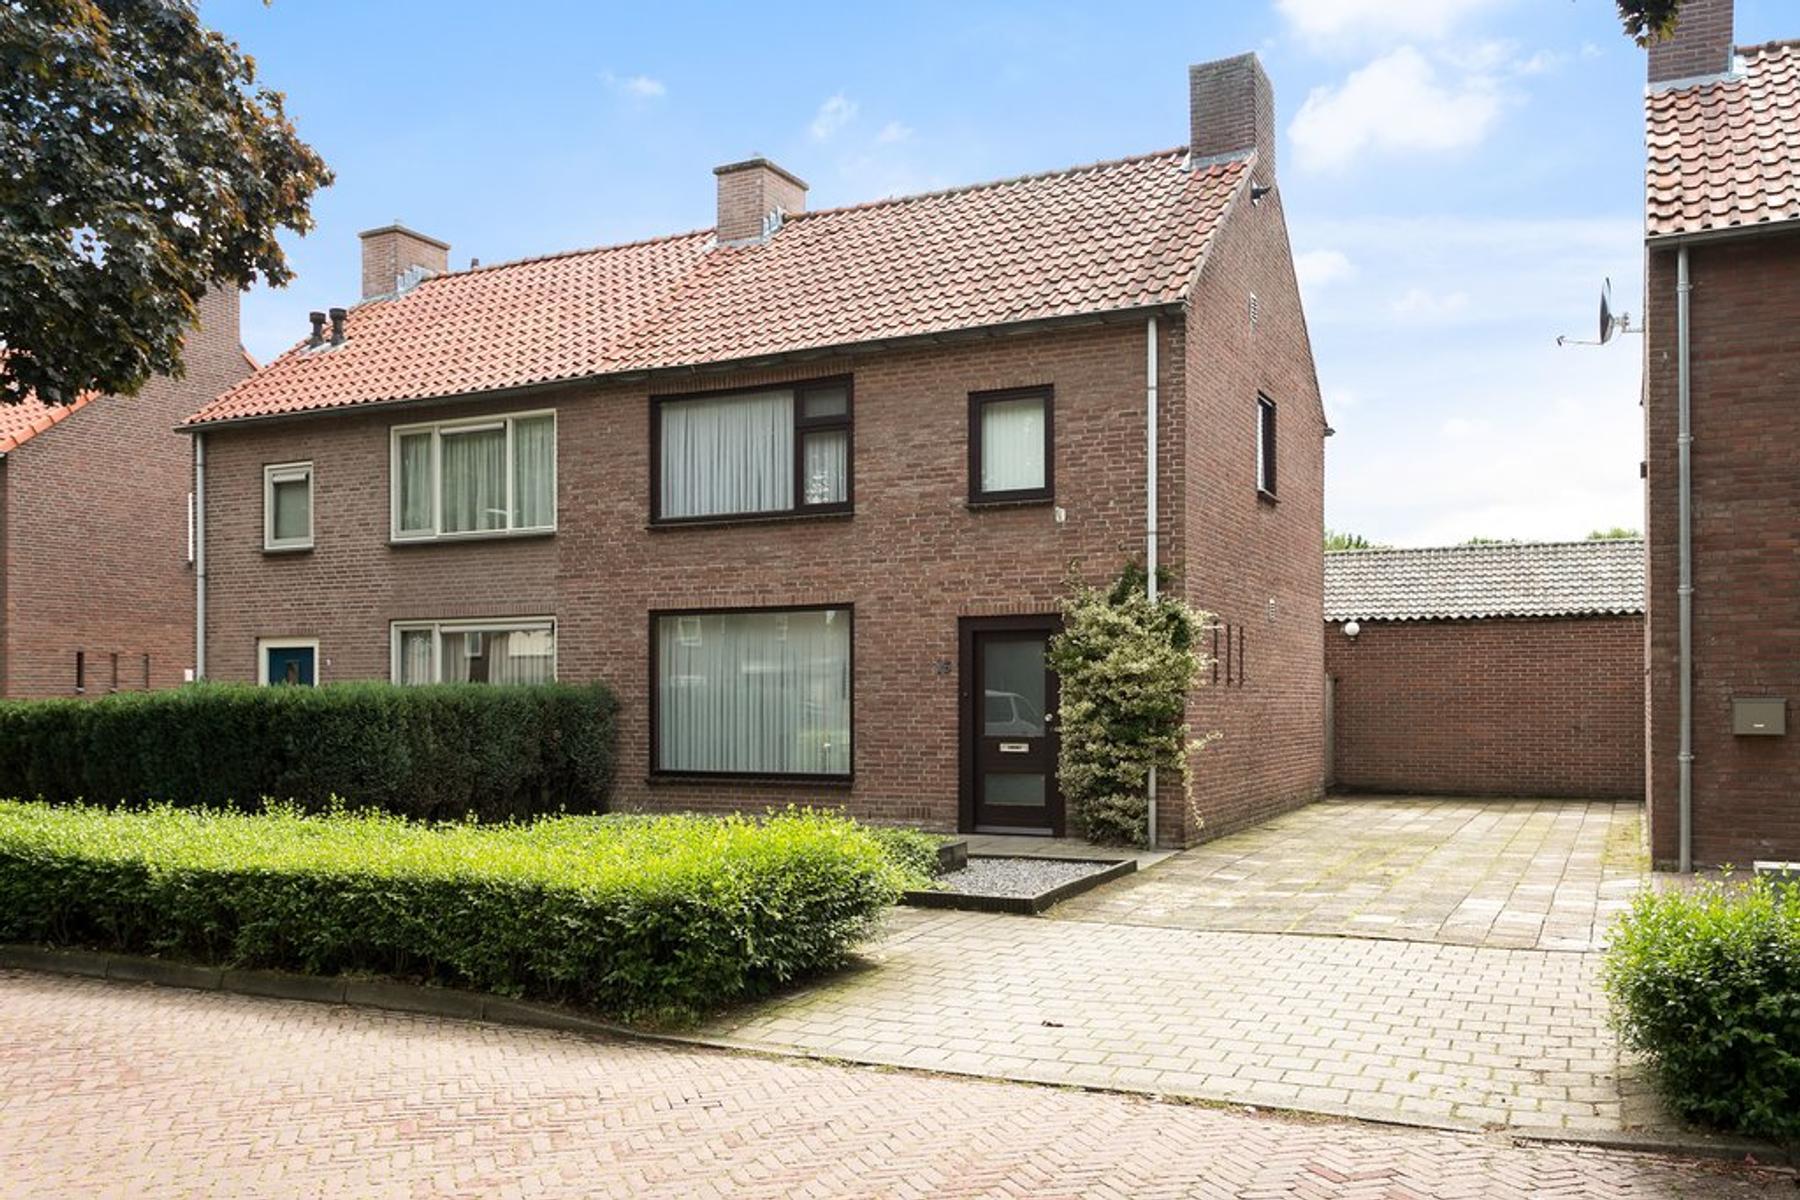 Van Gerwenstraat 16 in Hapert 5527 HD